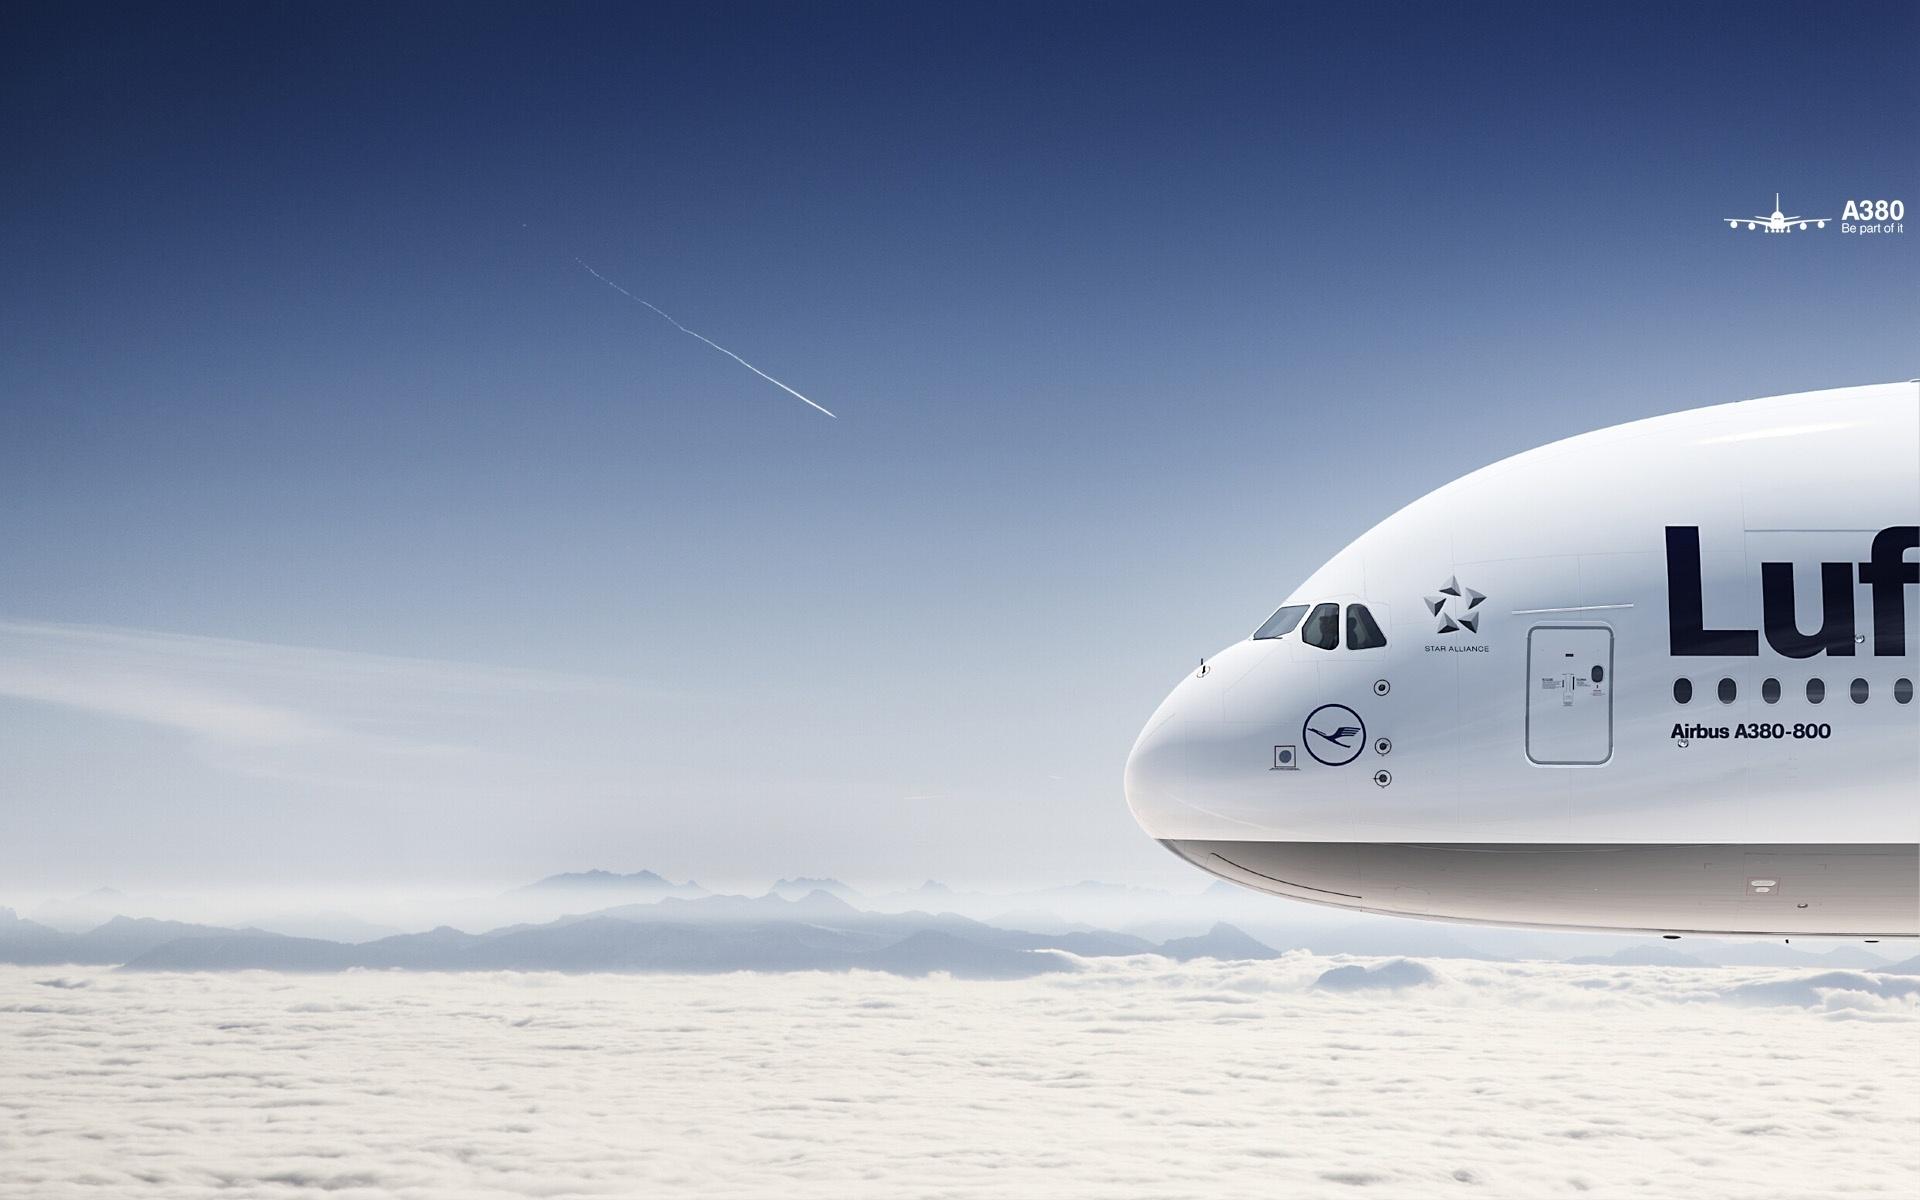 Самолет в небе, боинг, Lufhanza, обои на рабочий стол